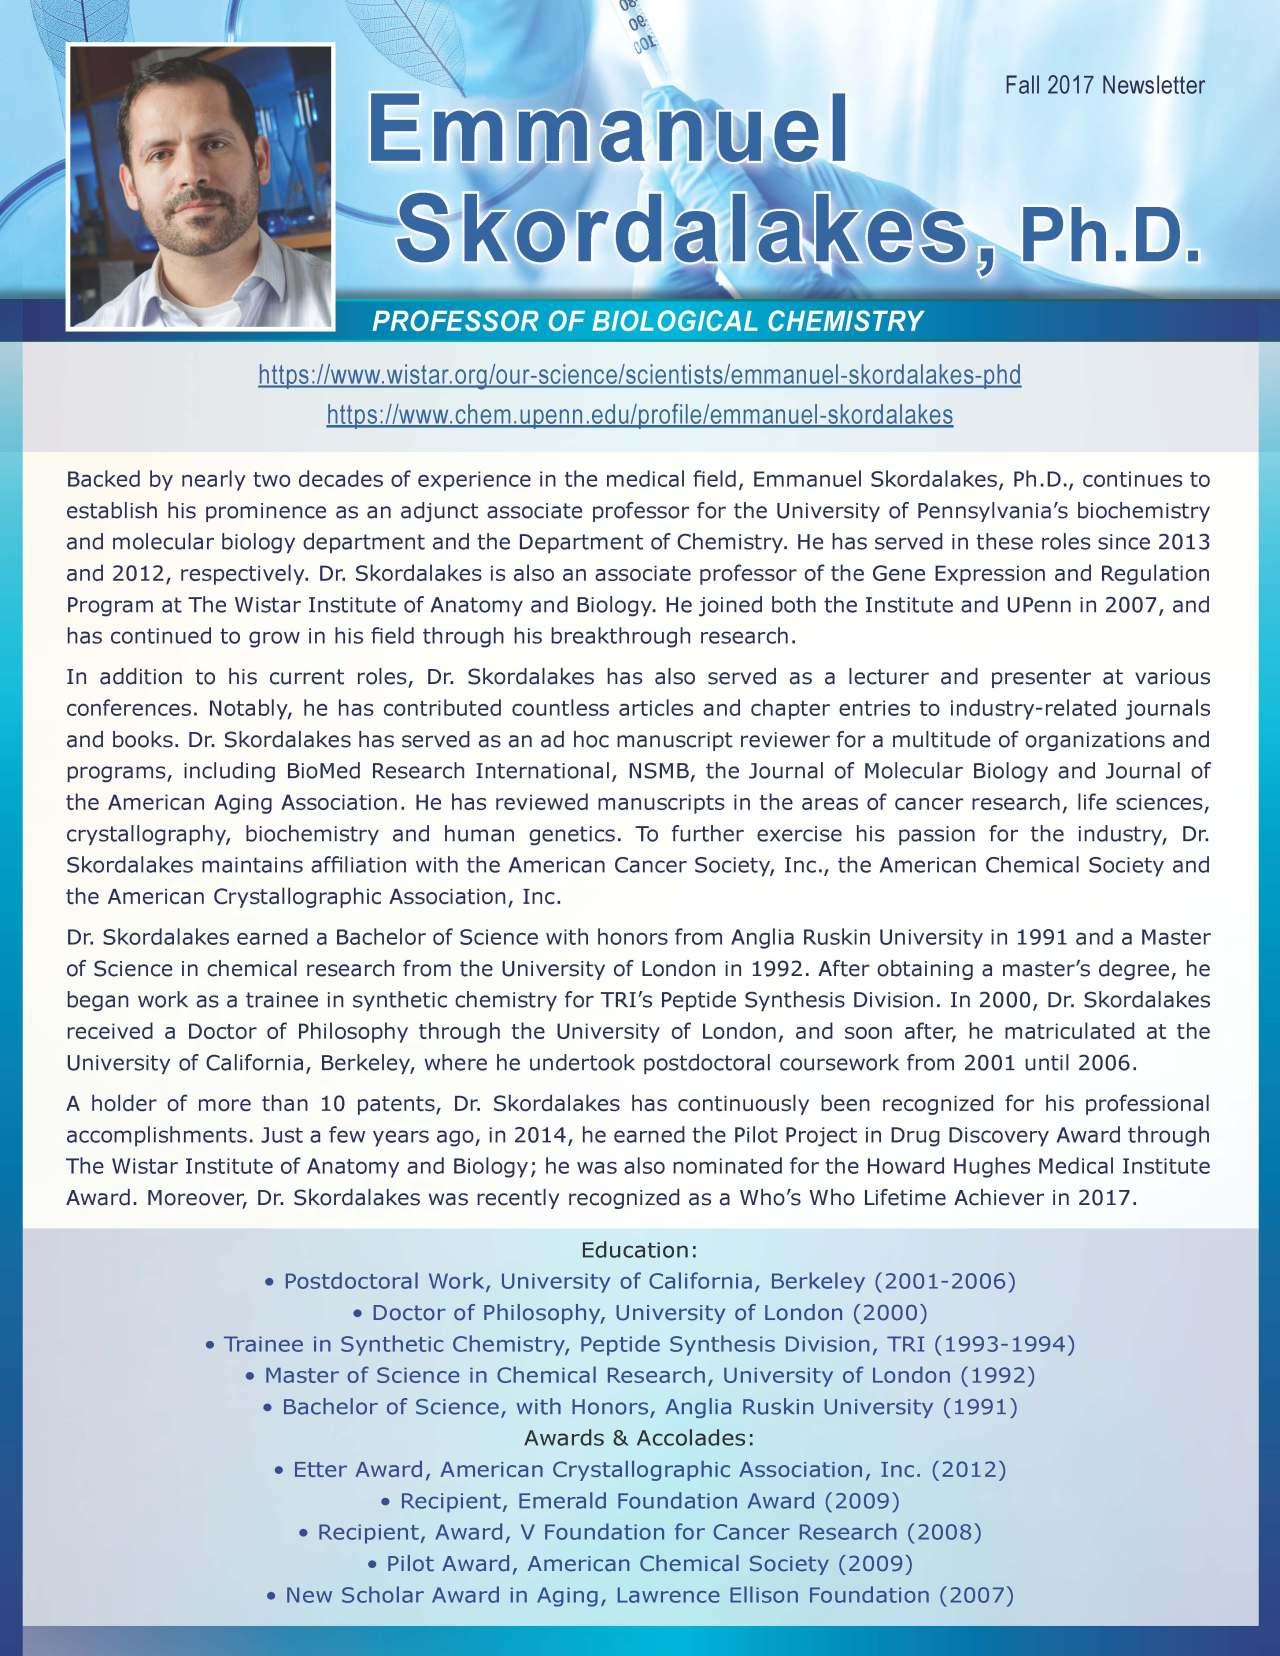 Skordalakes, Emmanuel 3685625_4003685625 Newsletter.jpg